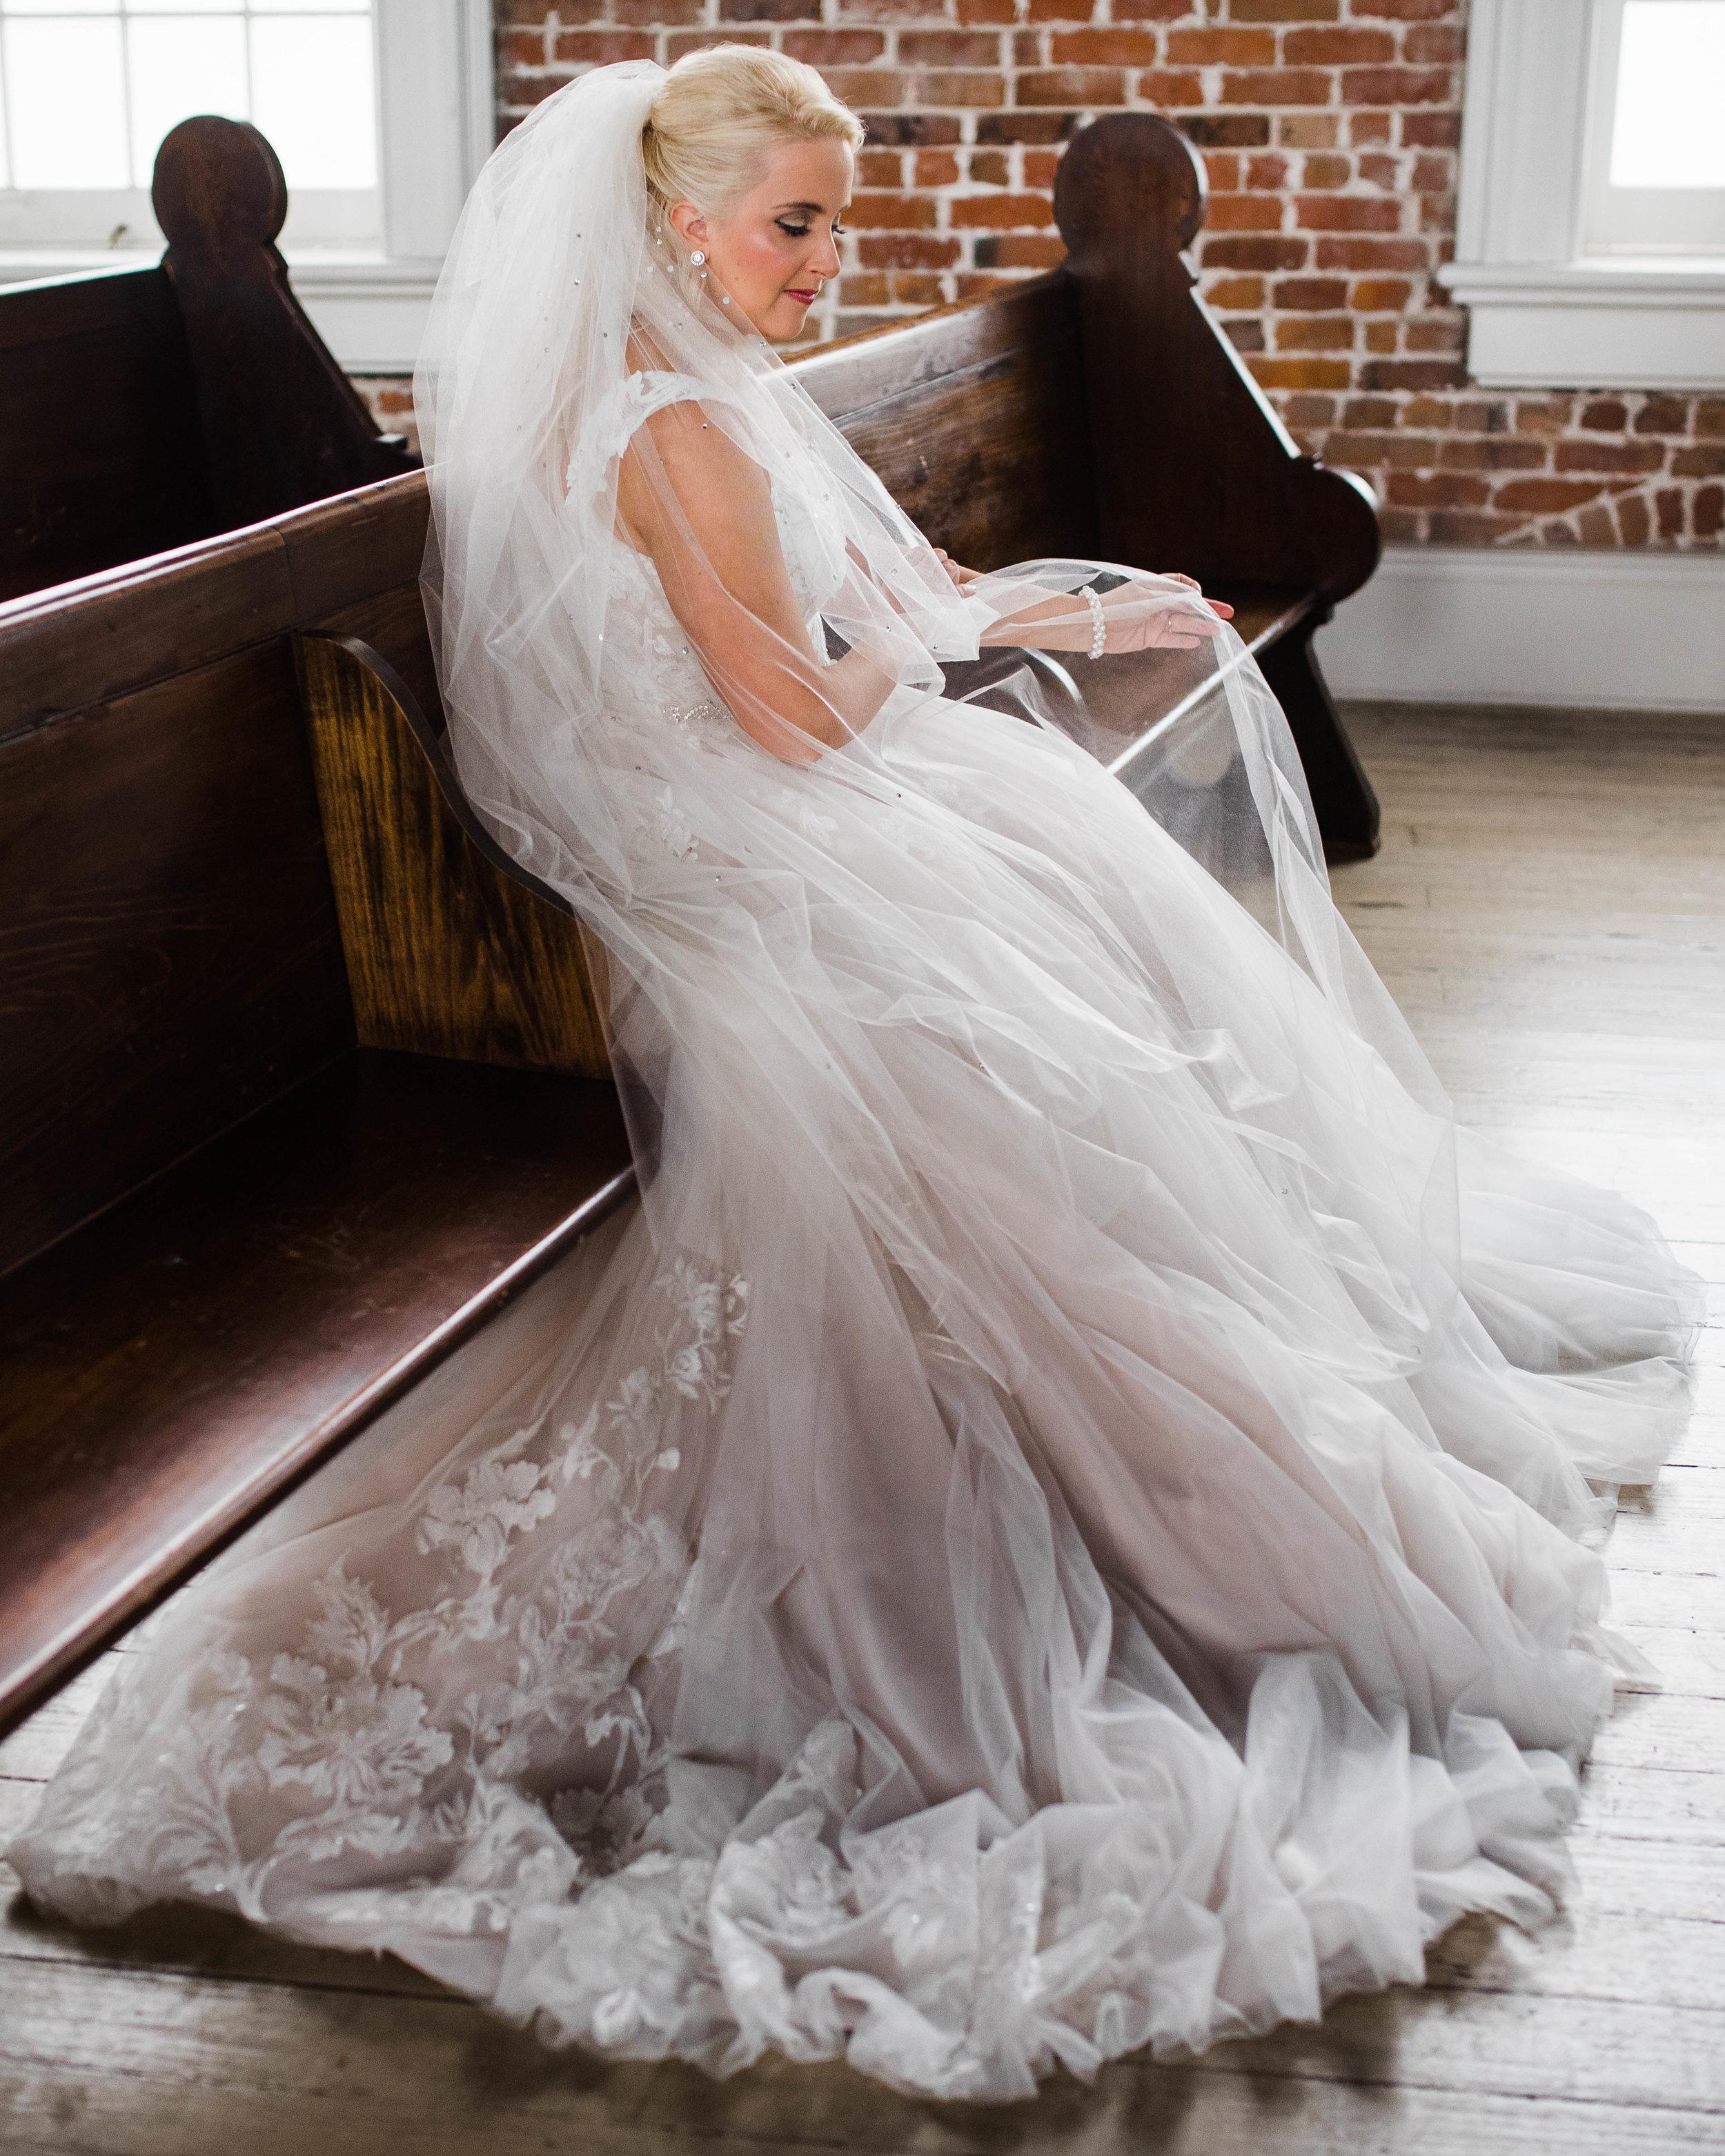 Kate-Felicity-Church-Bridal-Portraits_Gabby Chapin_Photography_Originals_00213.jpg